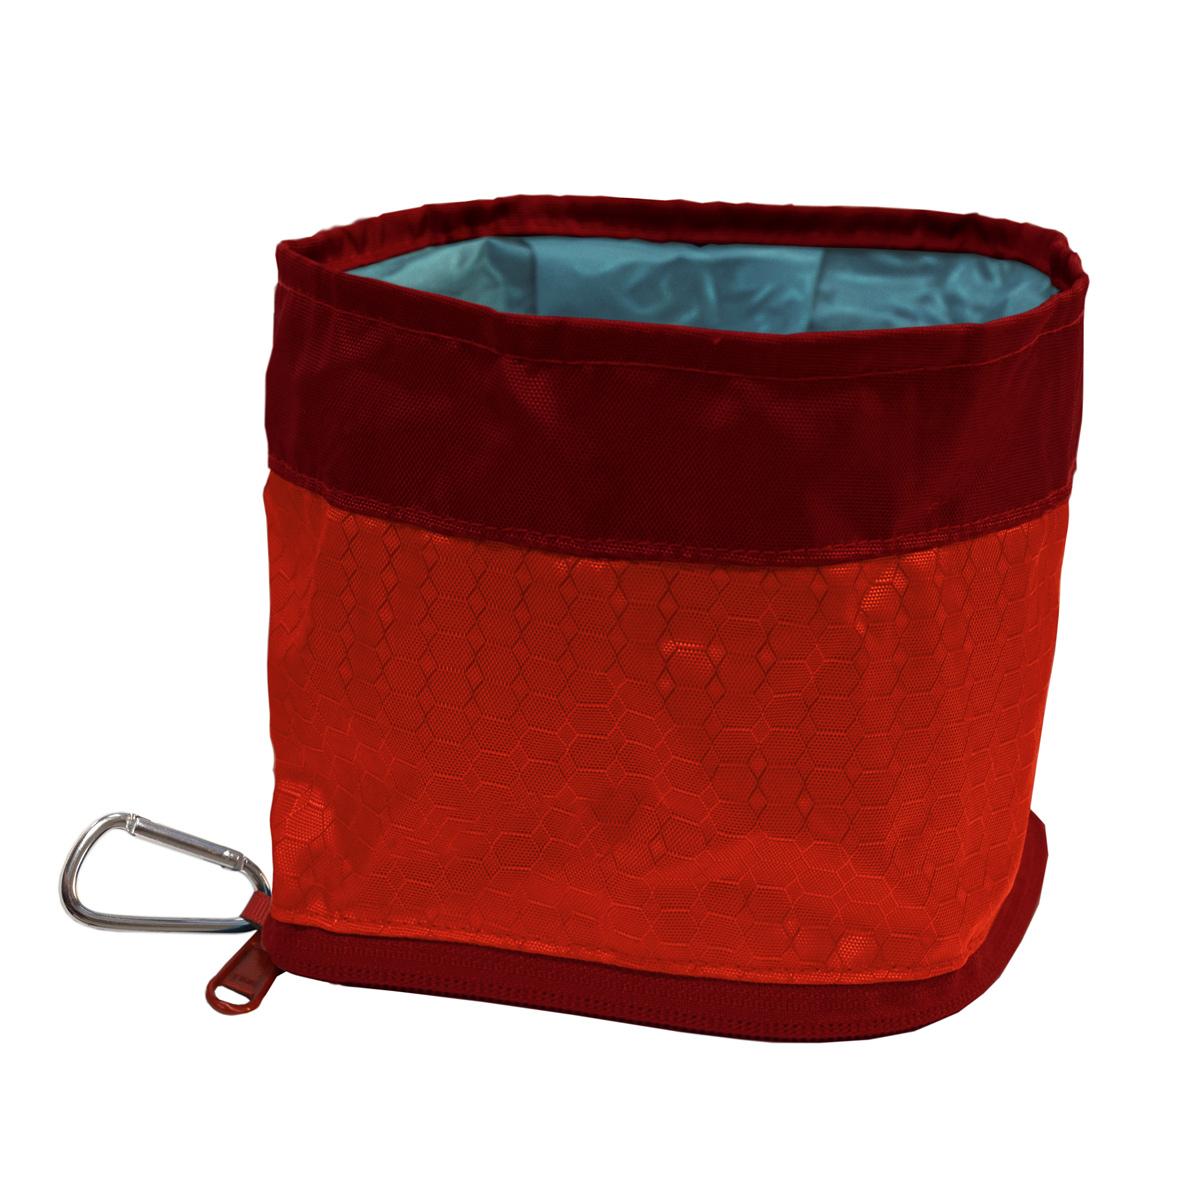 Zippy Dog Bowl by Kurgo - Barn Red